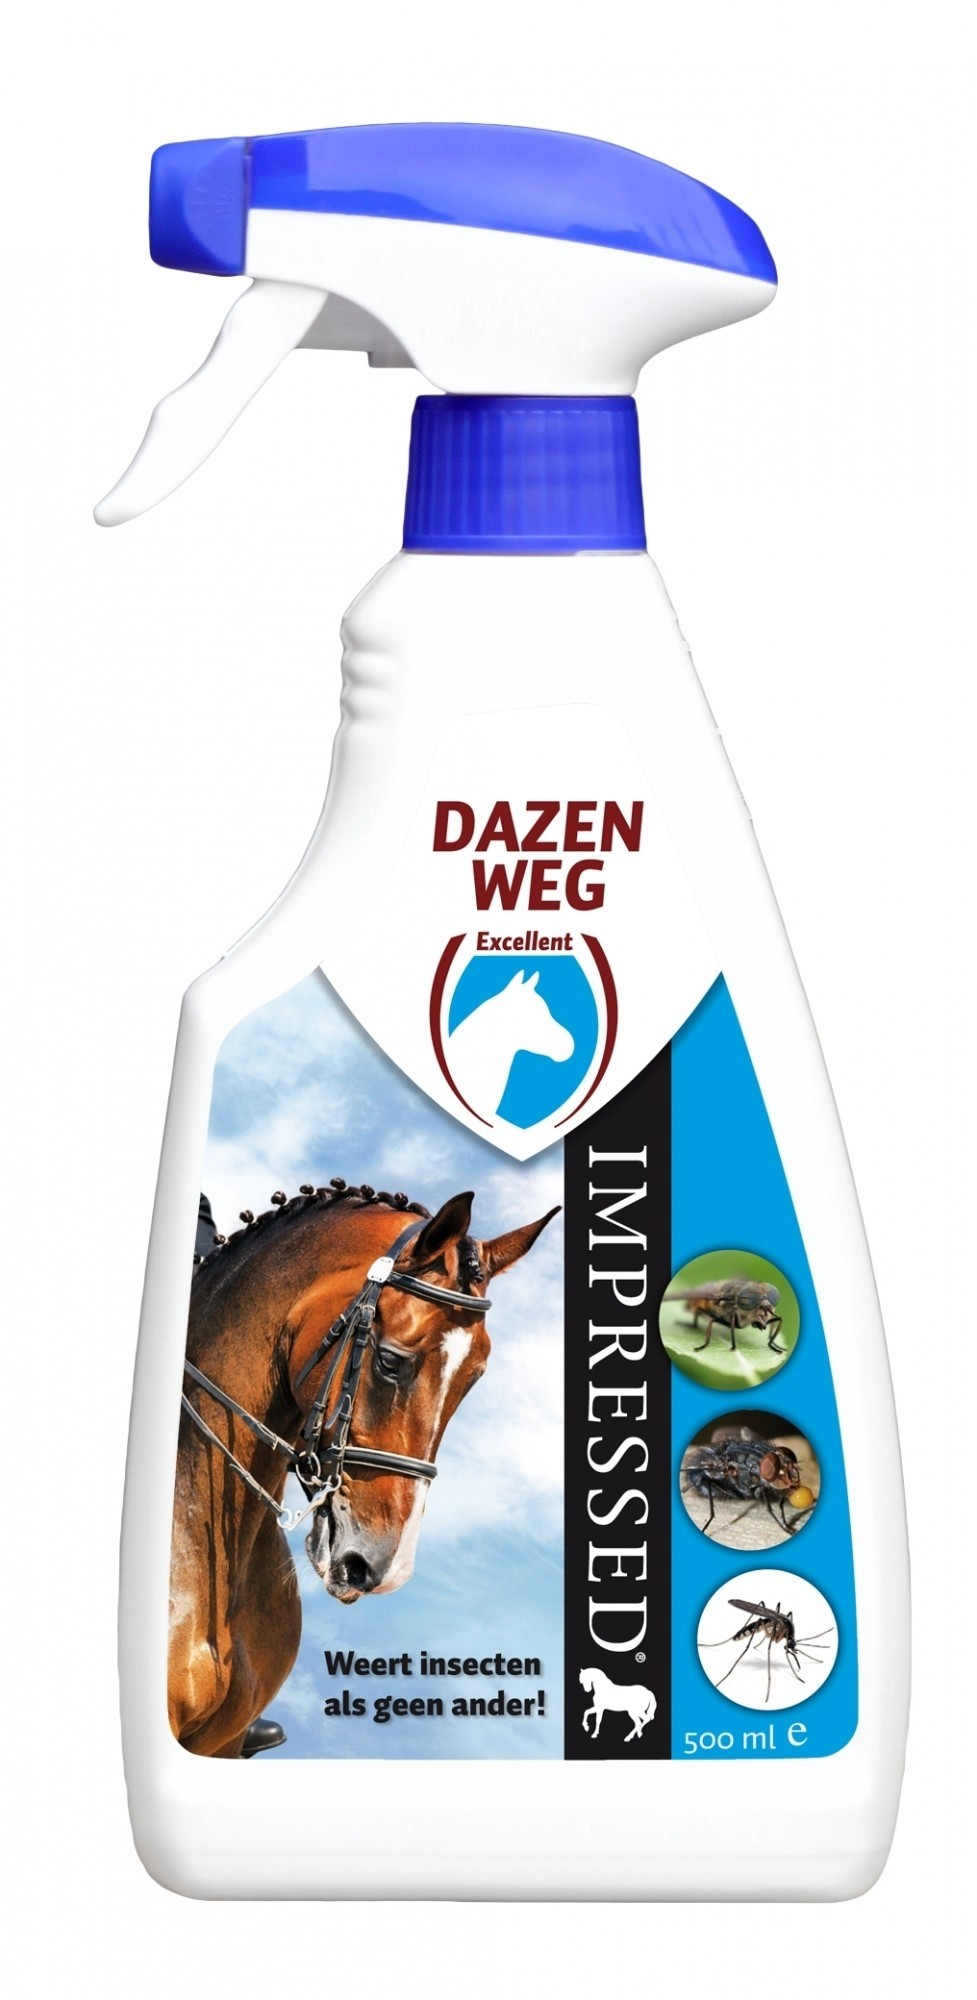 Dazen weg (insectenspray) 500ml